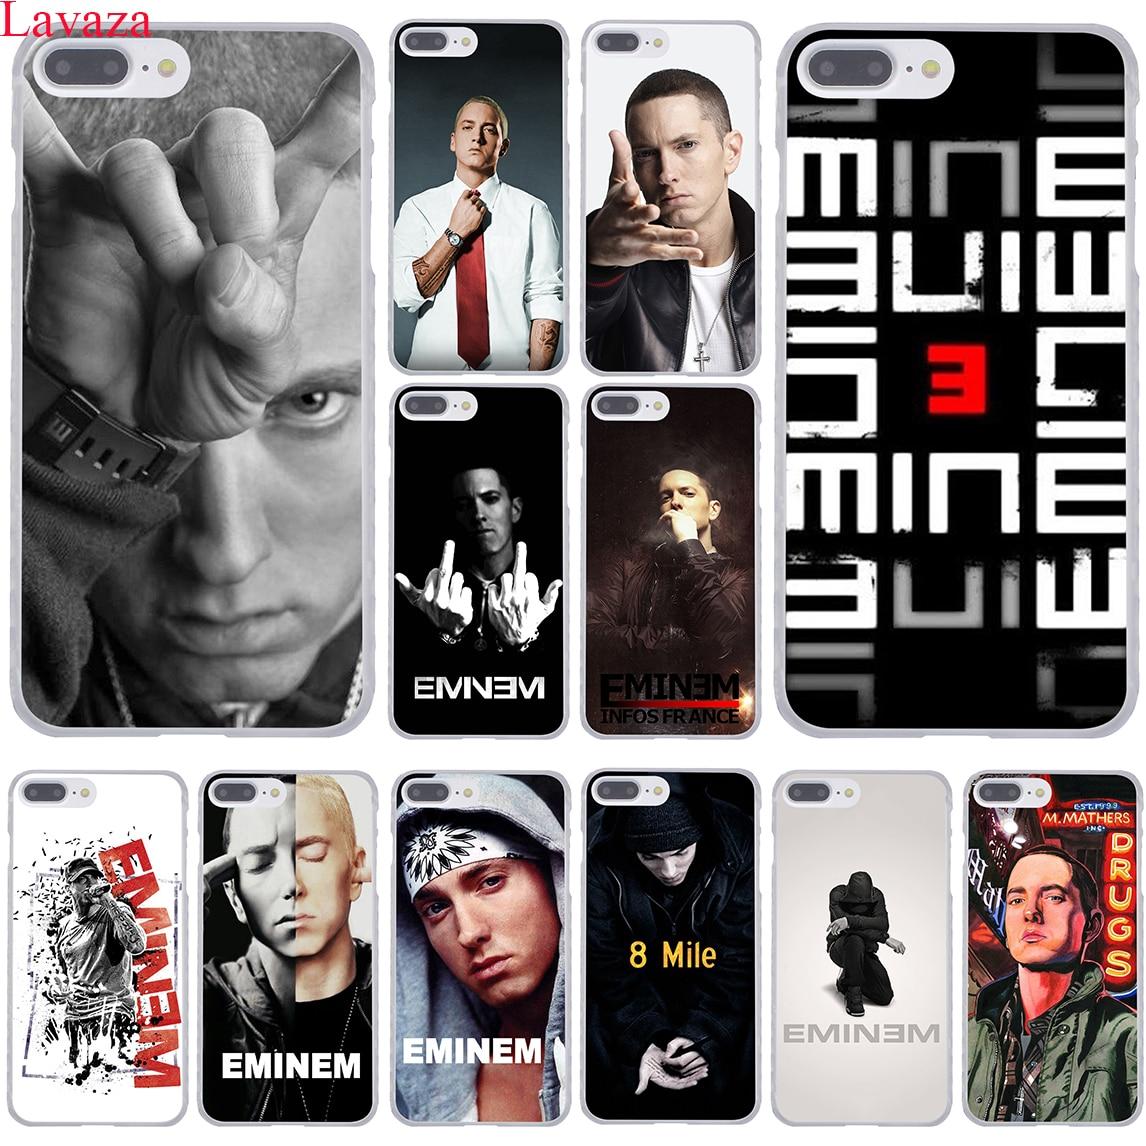 Lavaza хип-хоп рэппер Эминем рэп жесткий Coque В виде ракушки телефона чехол для Apple IPhone 8 7 6 6 S плюс x 10 5 5S SE 5C 4 4S крышка